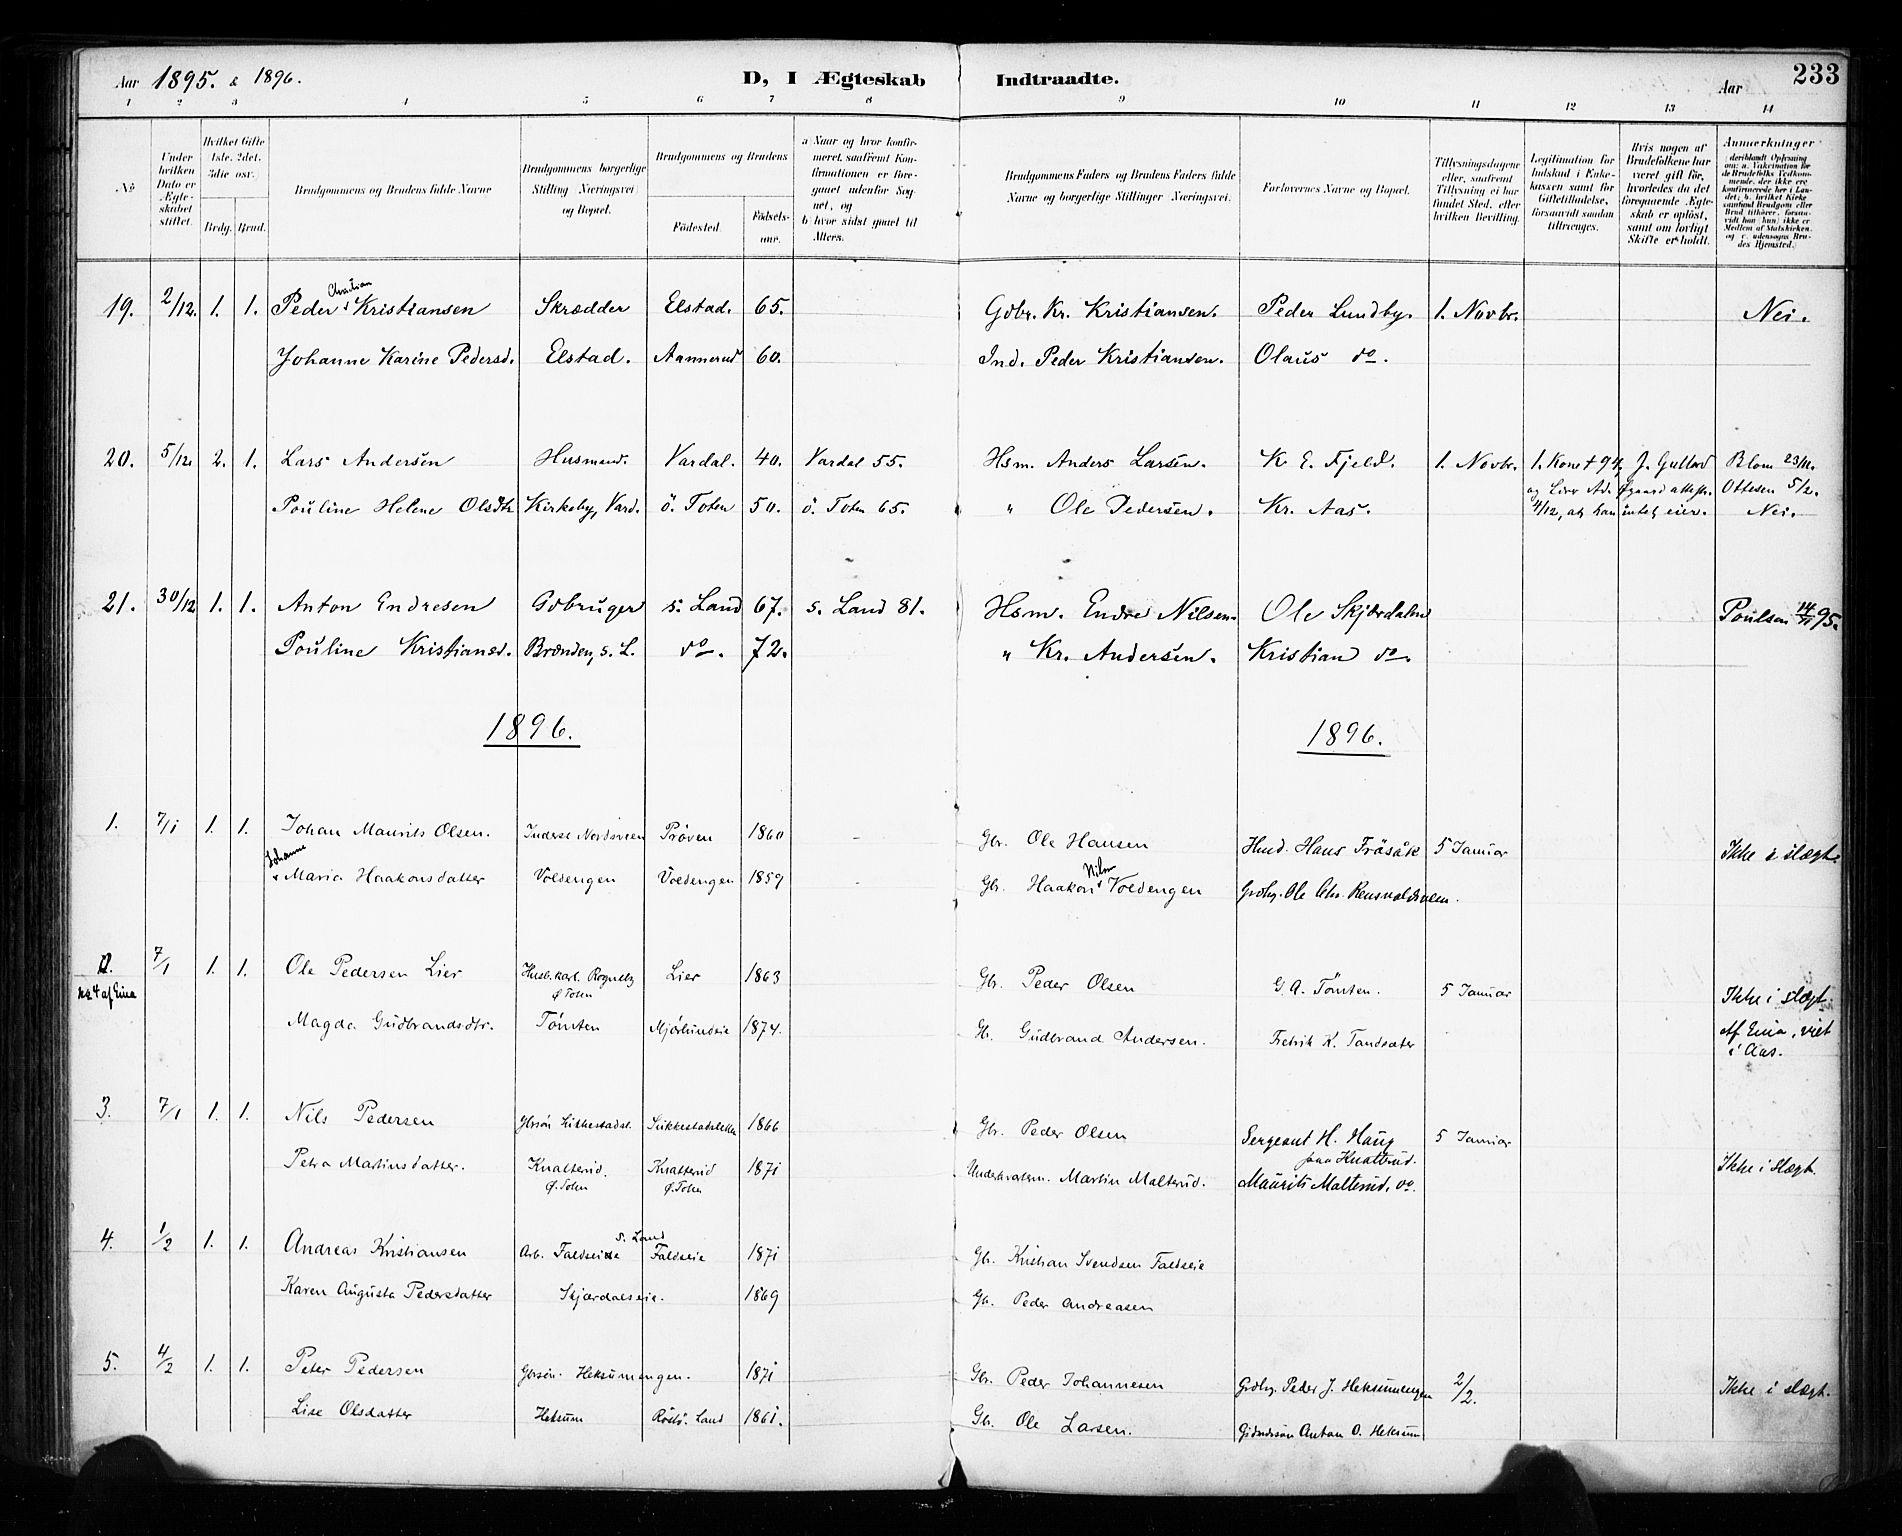 SAH, Vestre Toten prestekontor, H/Ha/Haa/L0011: Ministerialbok nr. 11, 1895-1906, s. 233